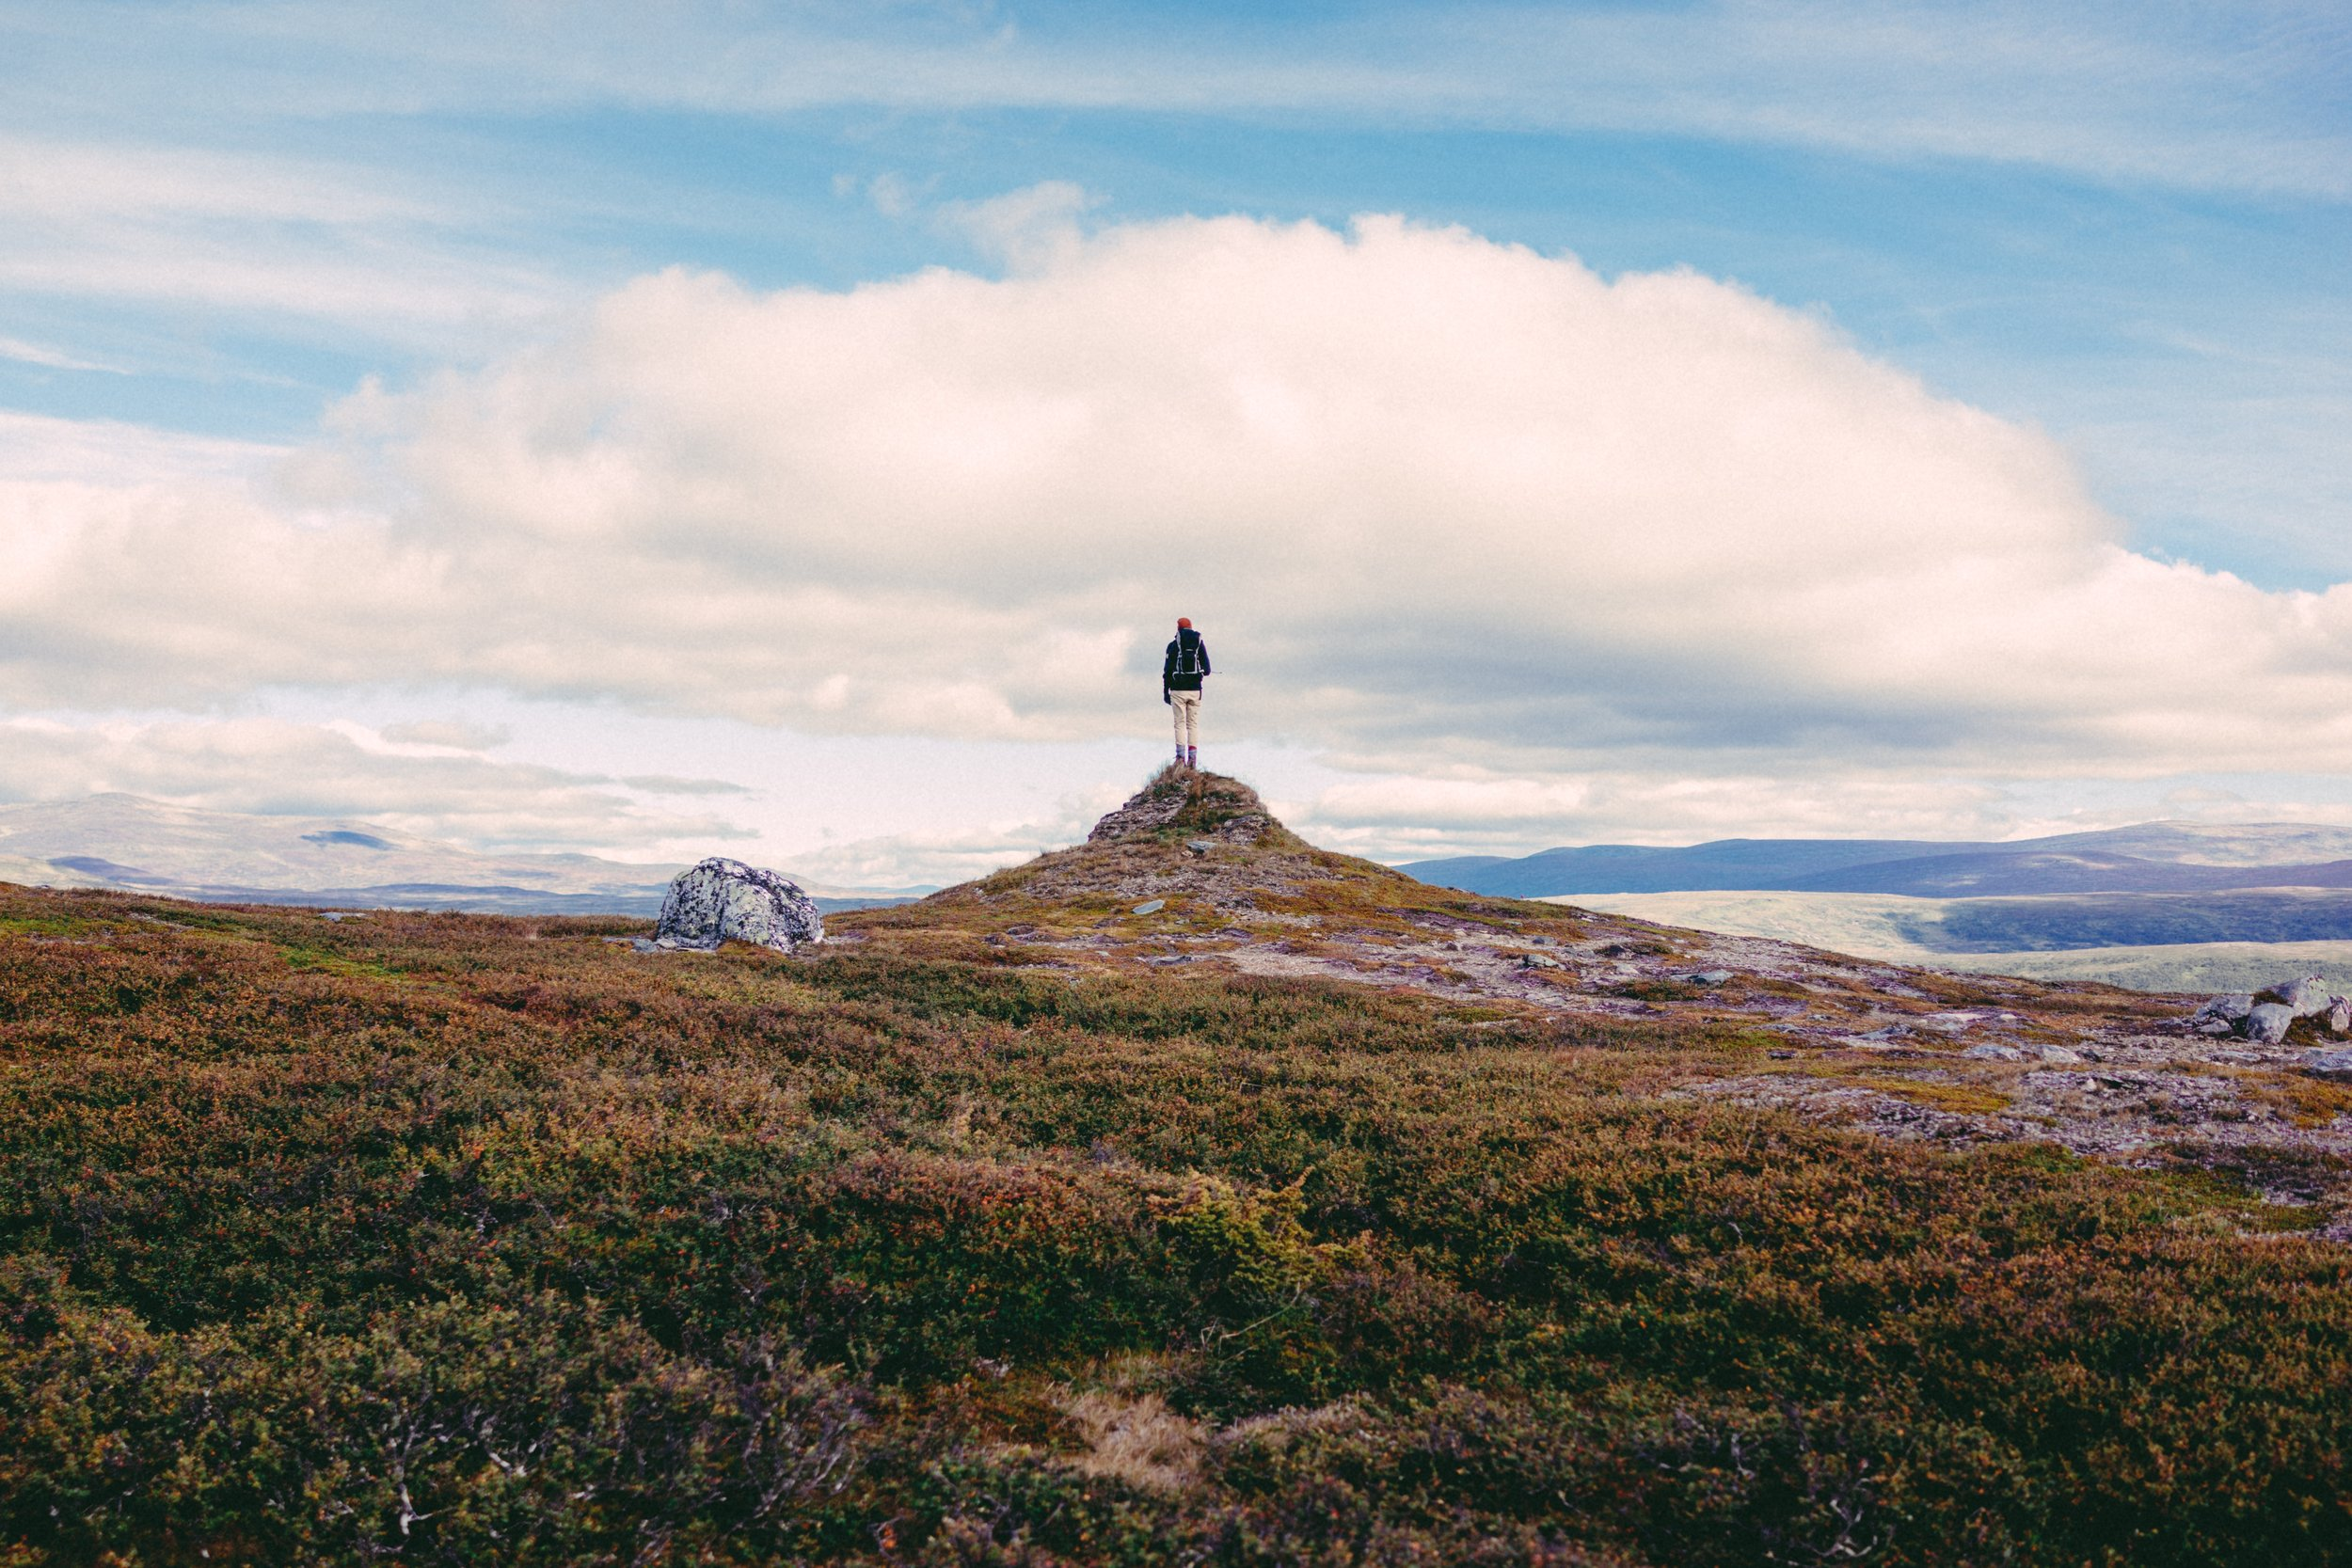 Photo by  nina lindgren on  Unsplash